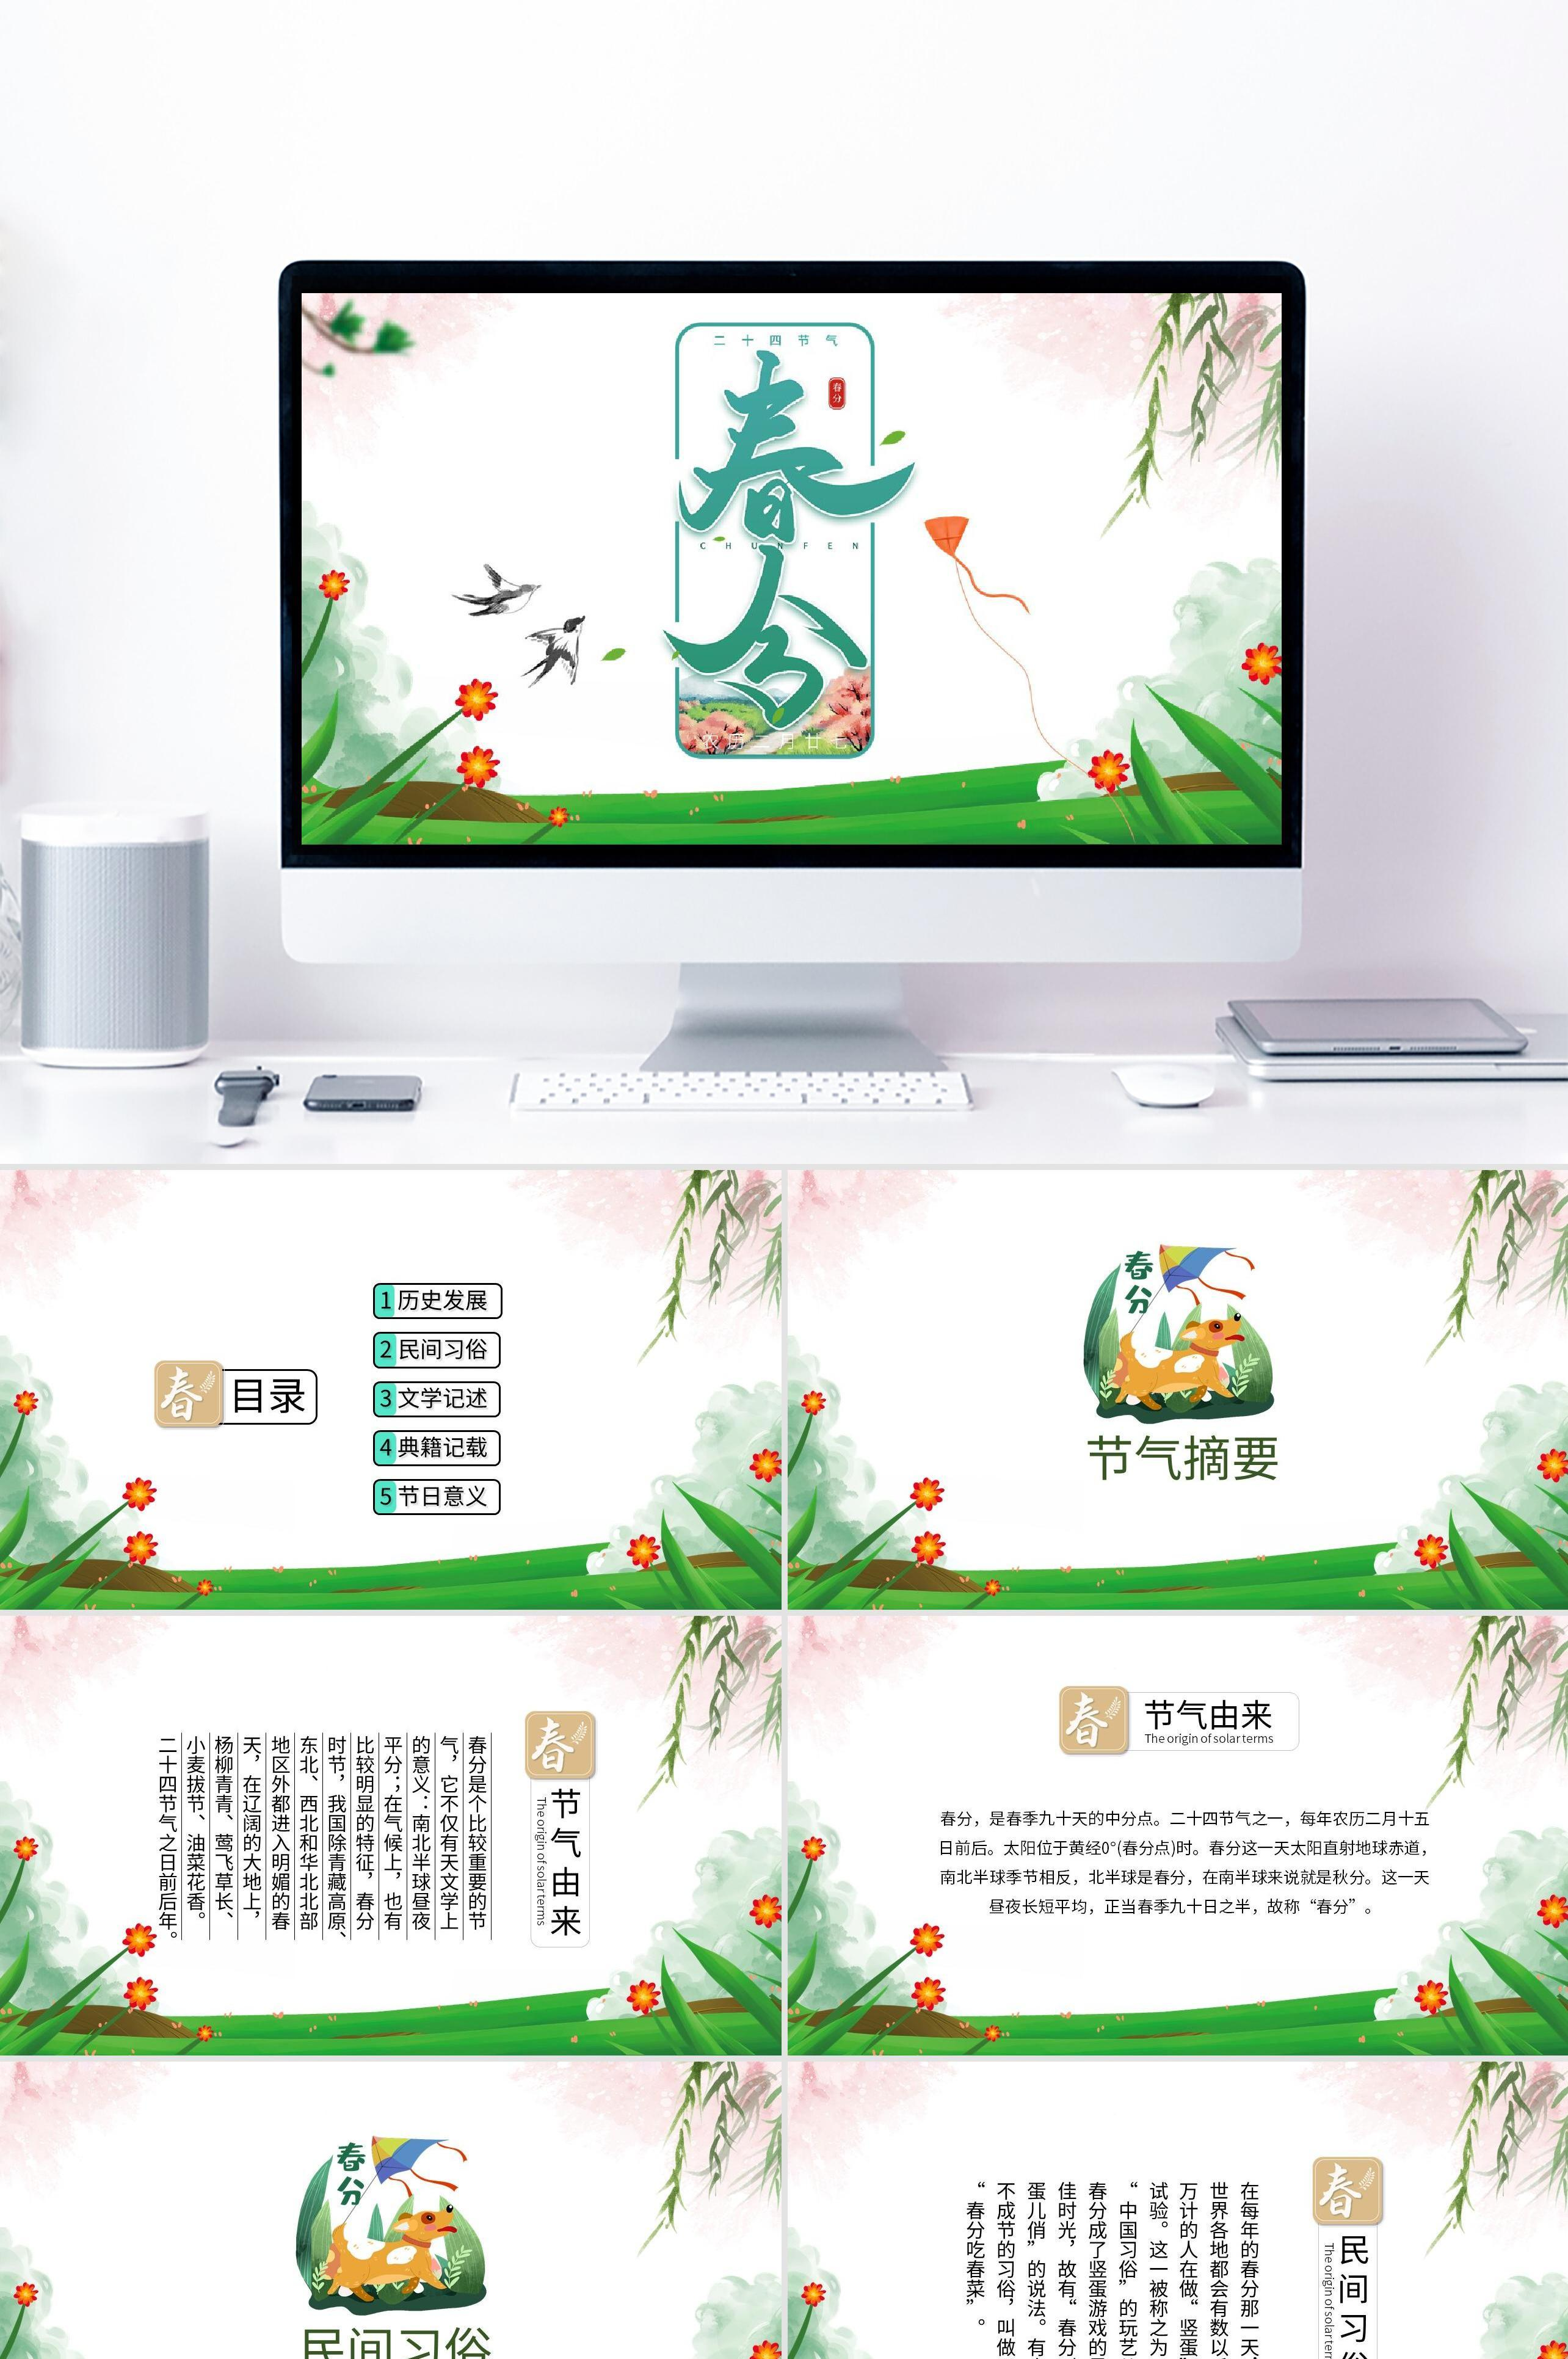 绿色清新24节气春分PPT模板